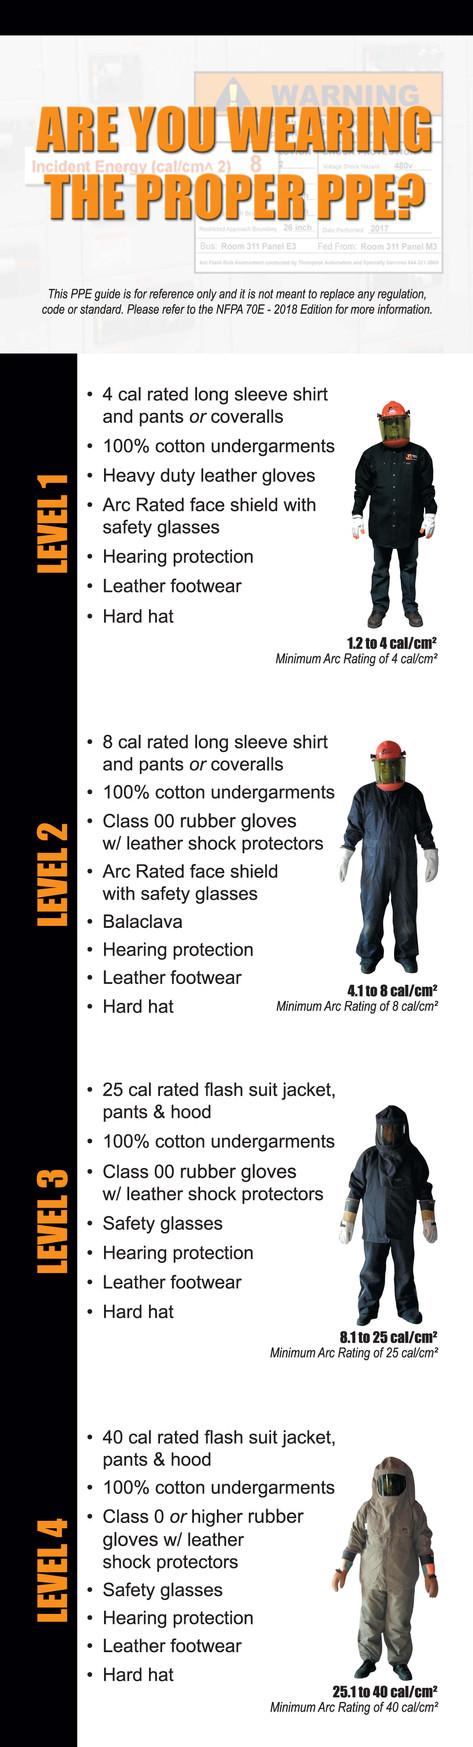 Proper PPE Printed Piece